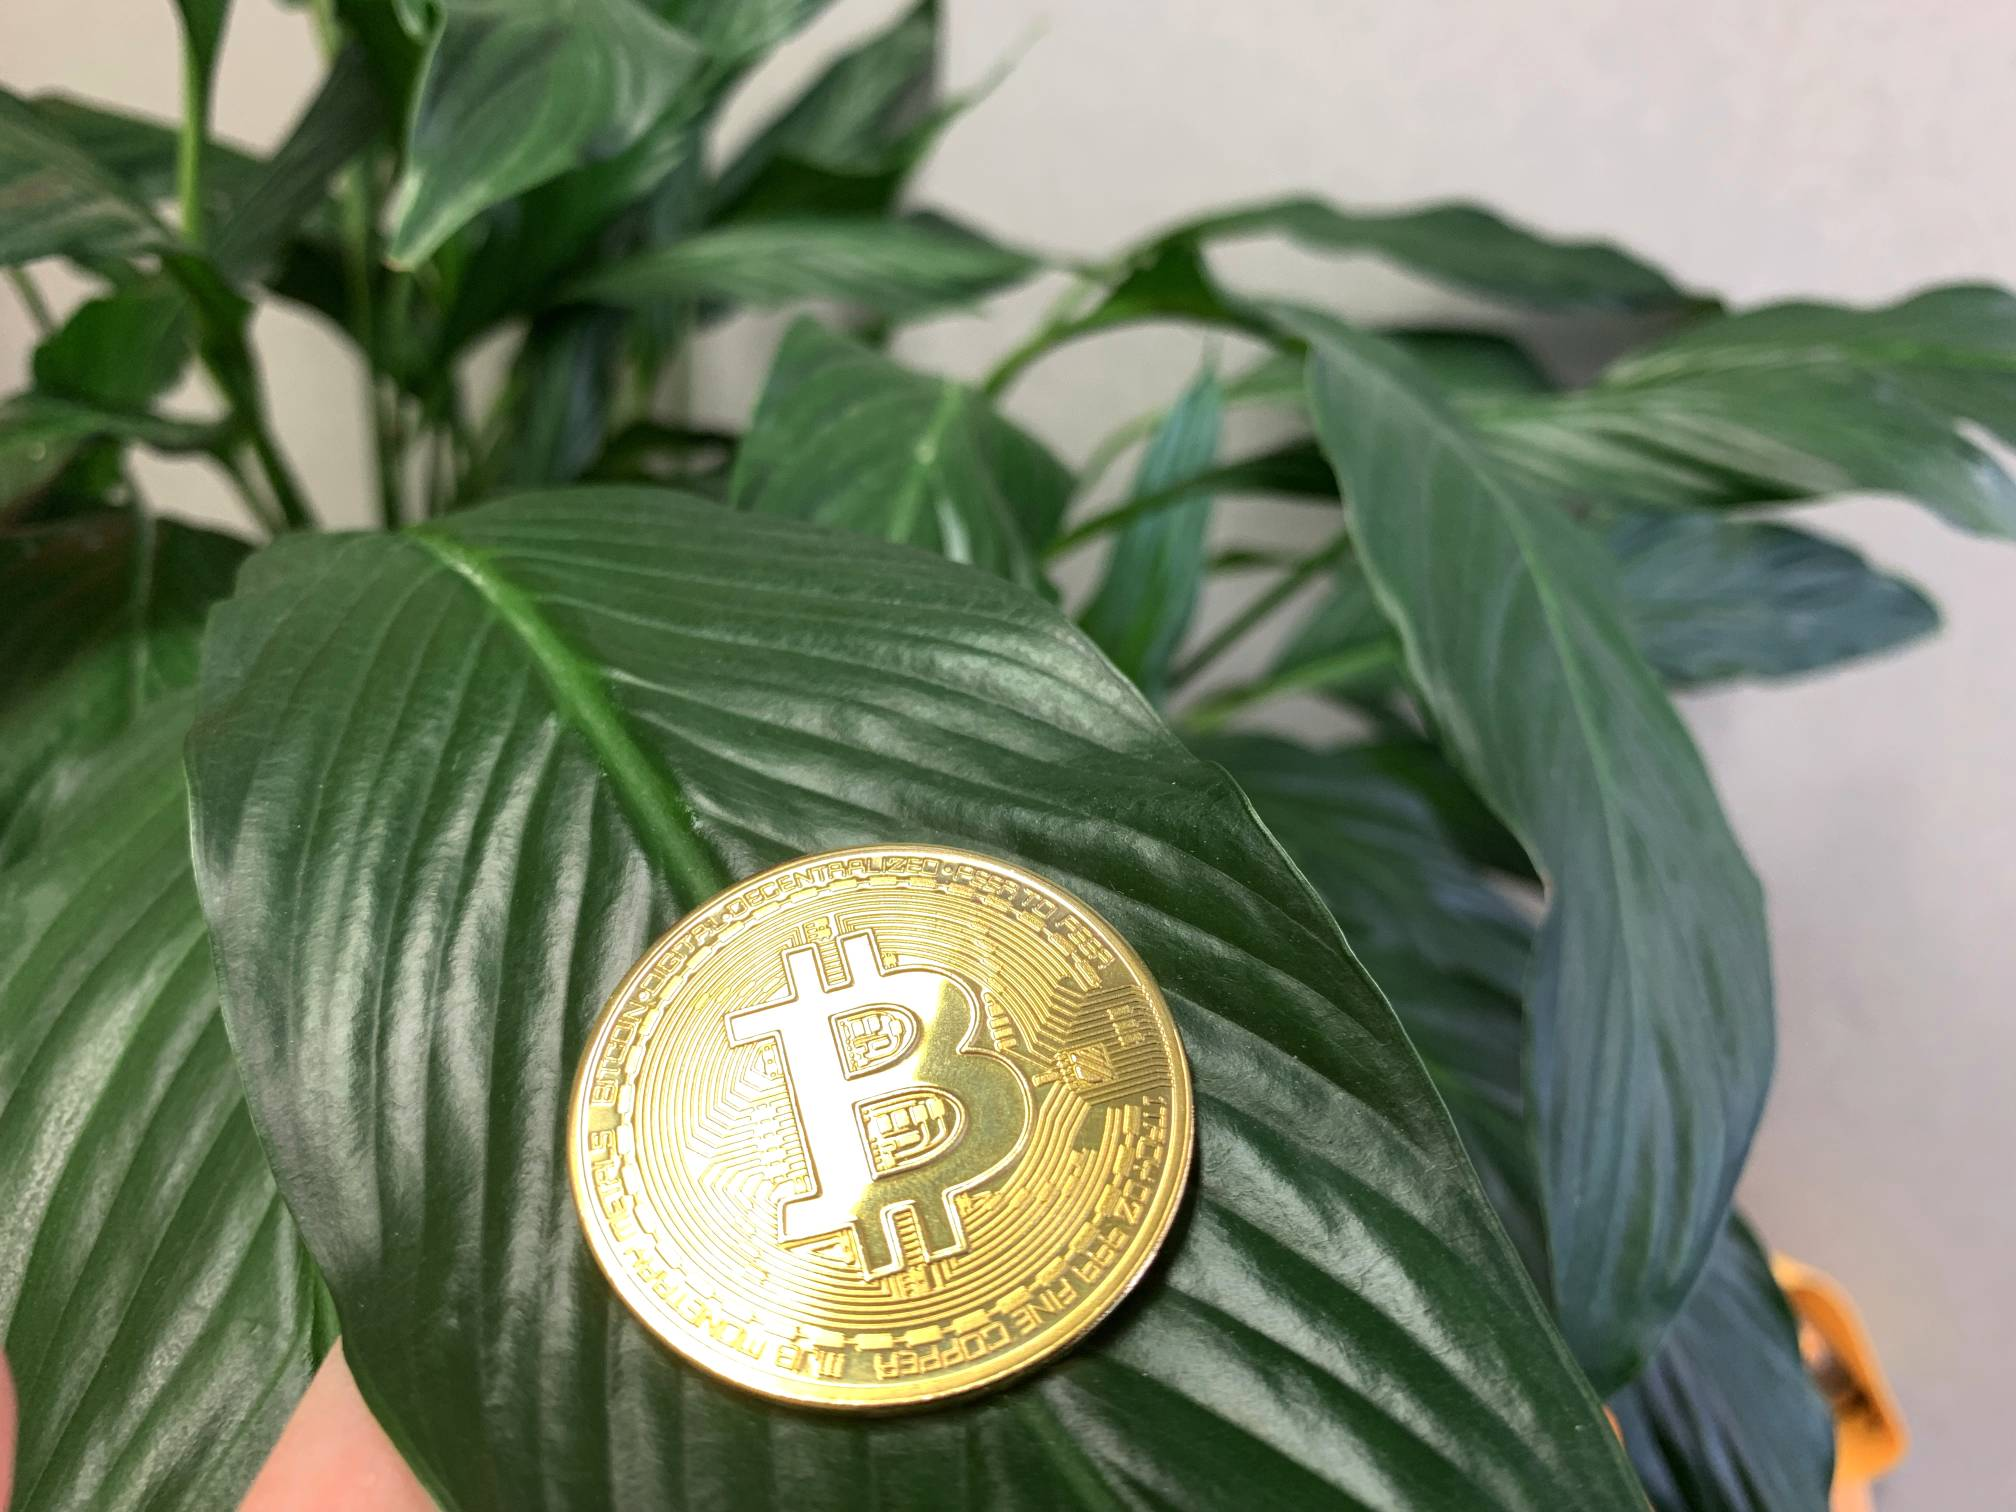 Bitcoin Shining On Green House Plant